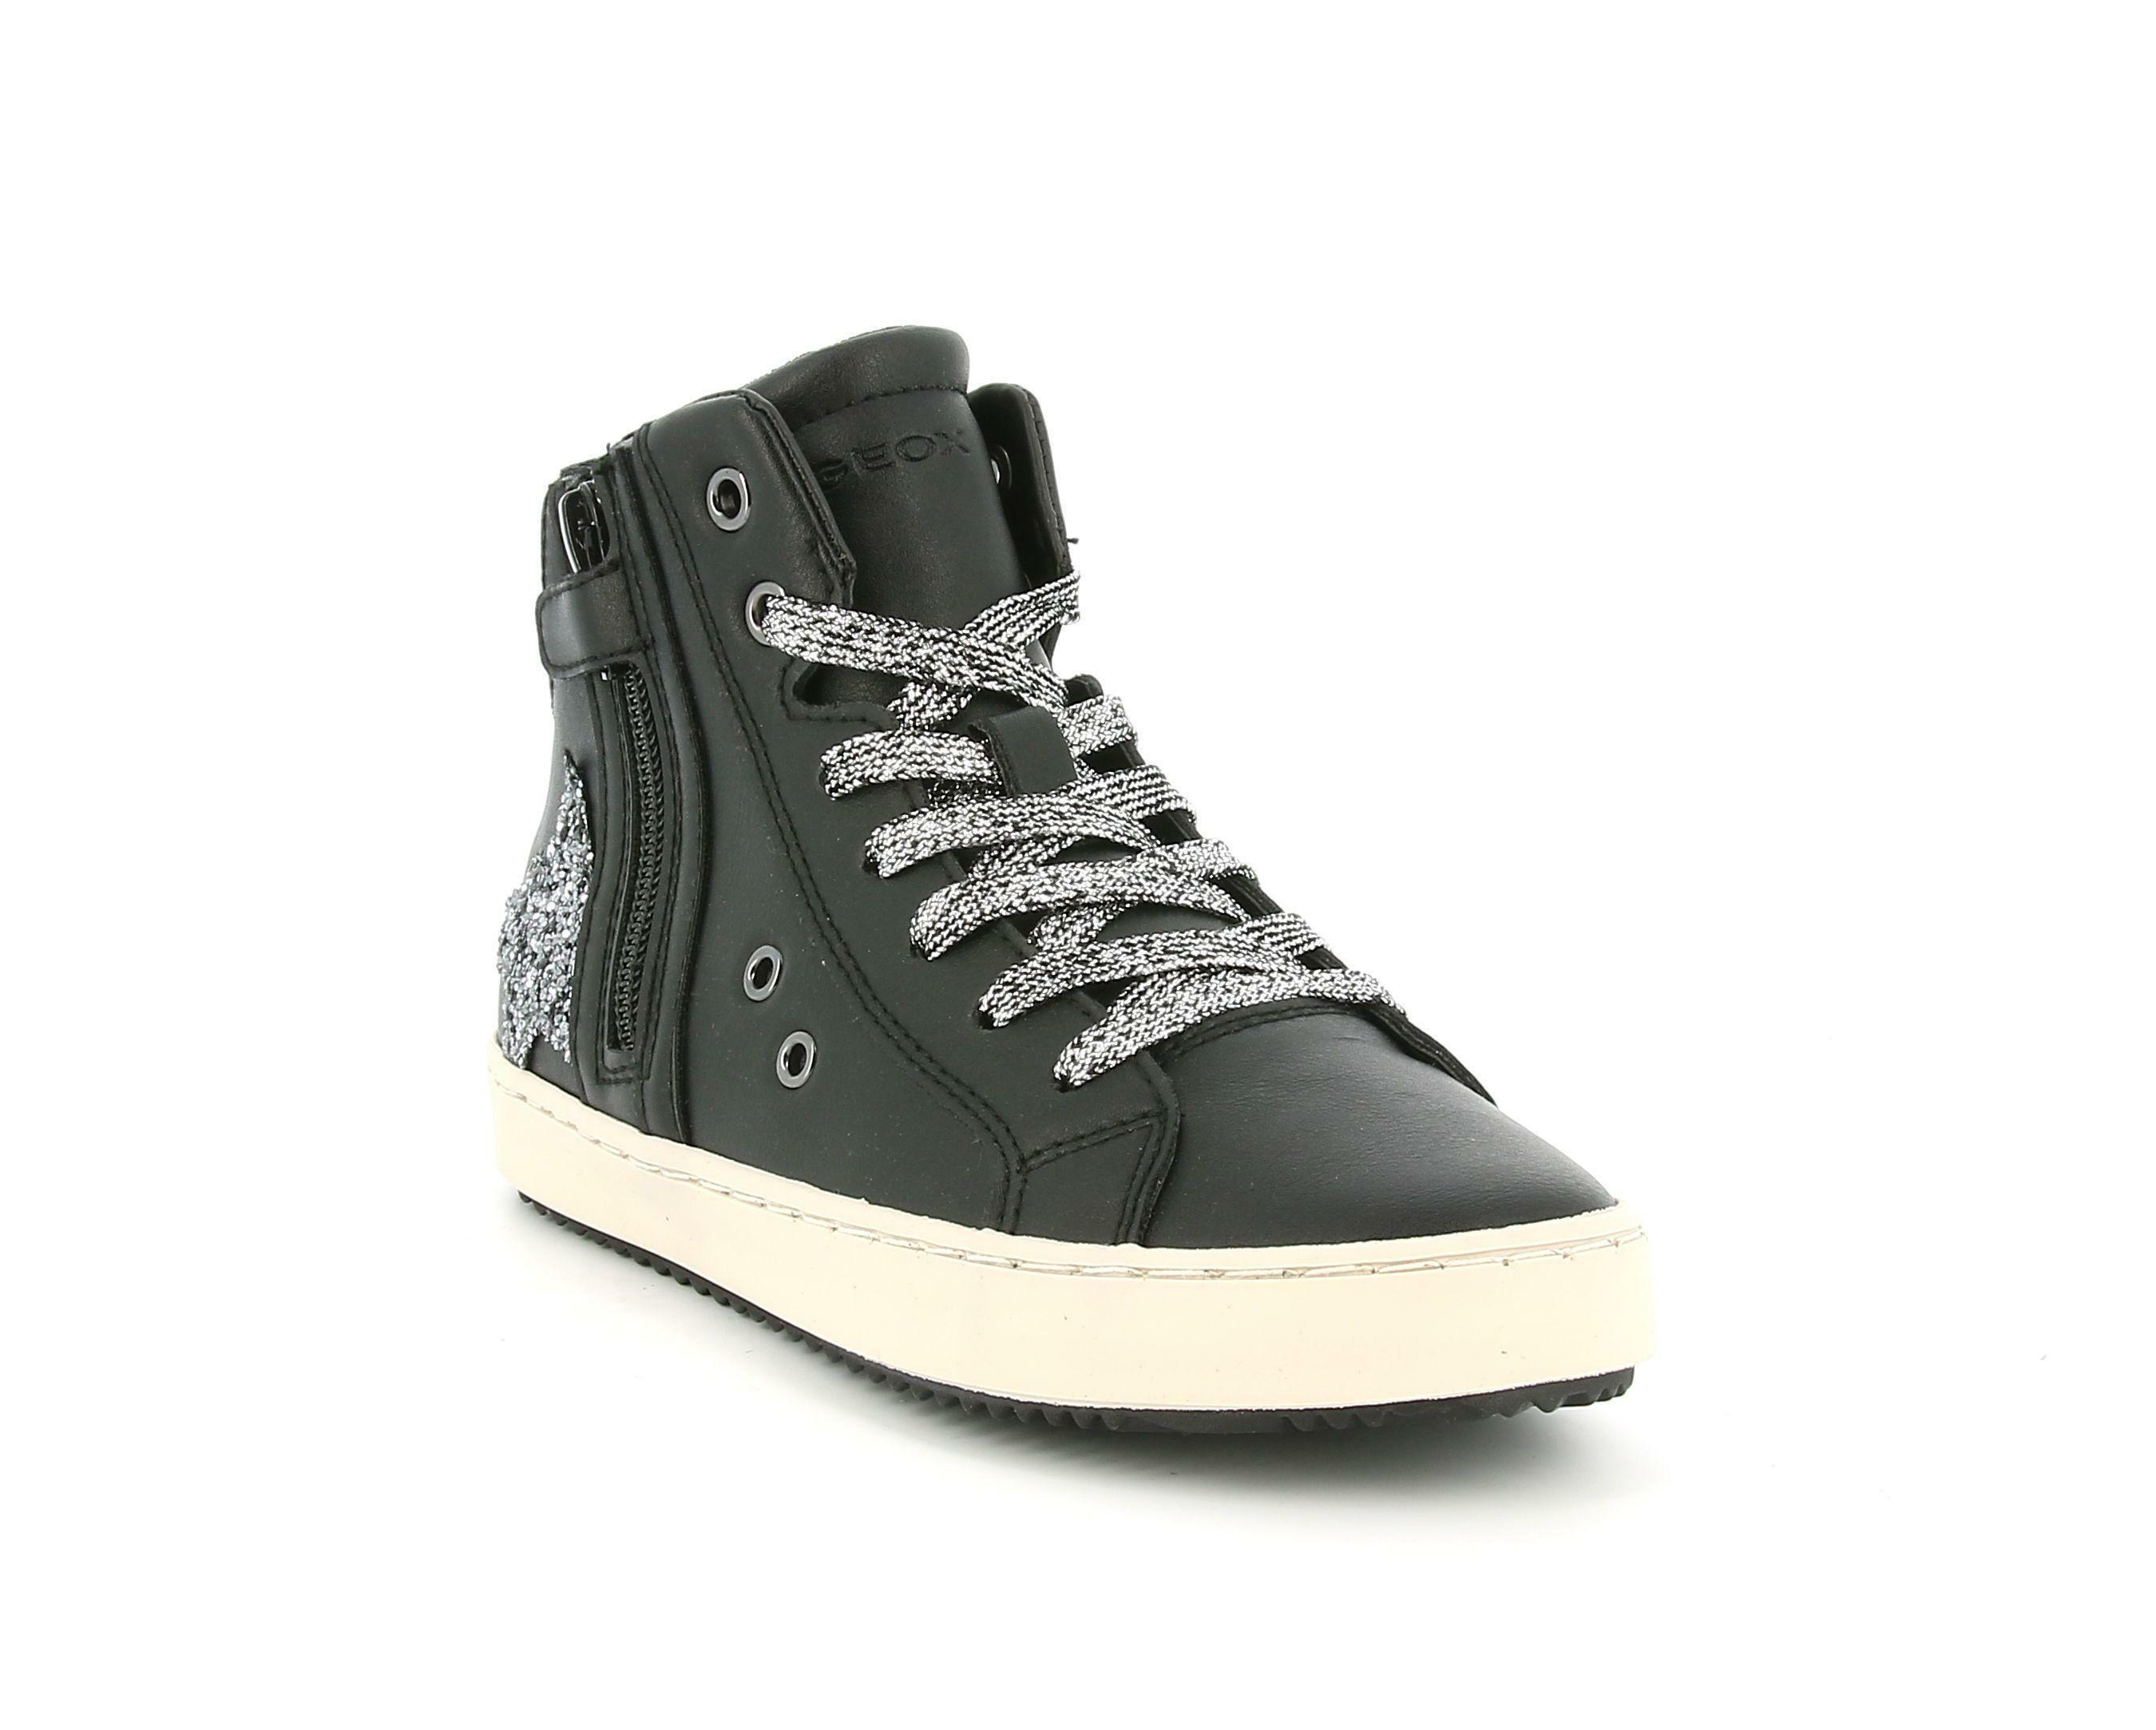 geox geox j kalispera girl j044ga000nf sneaker